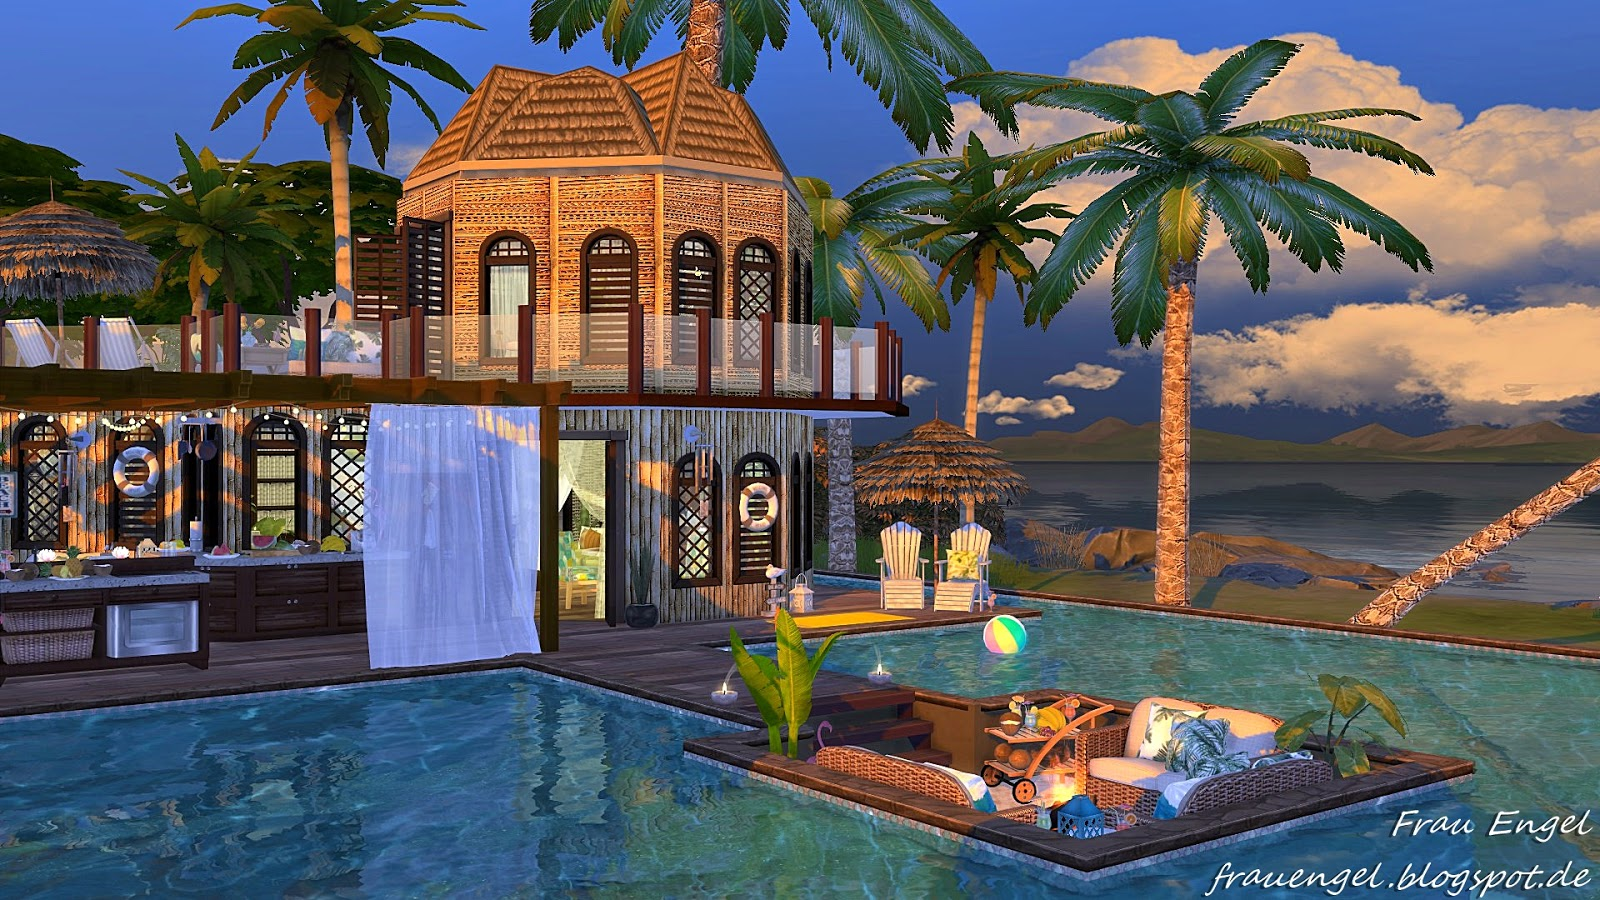 Frau Engel: TS4! Vacation Paradise